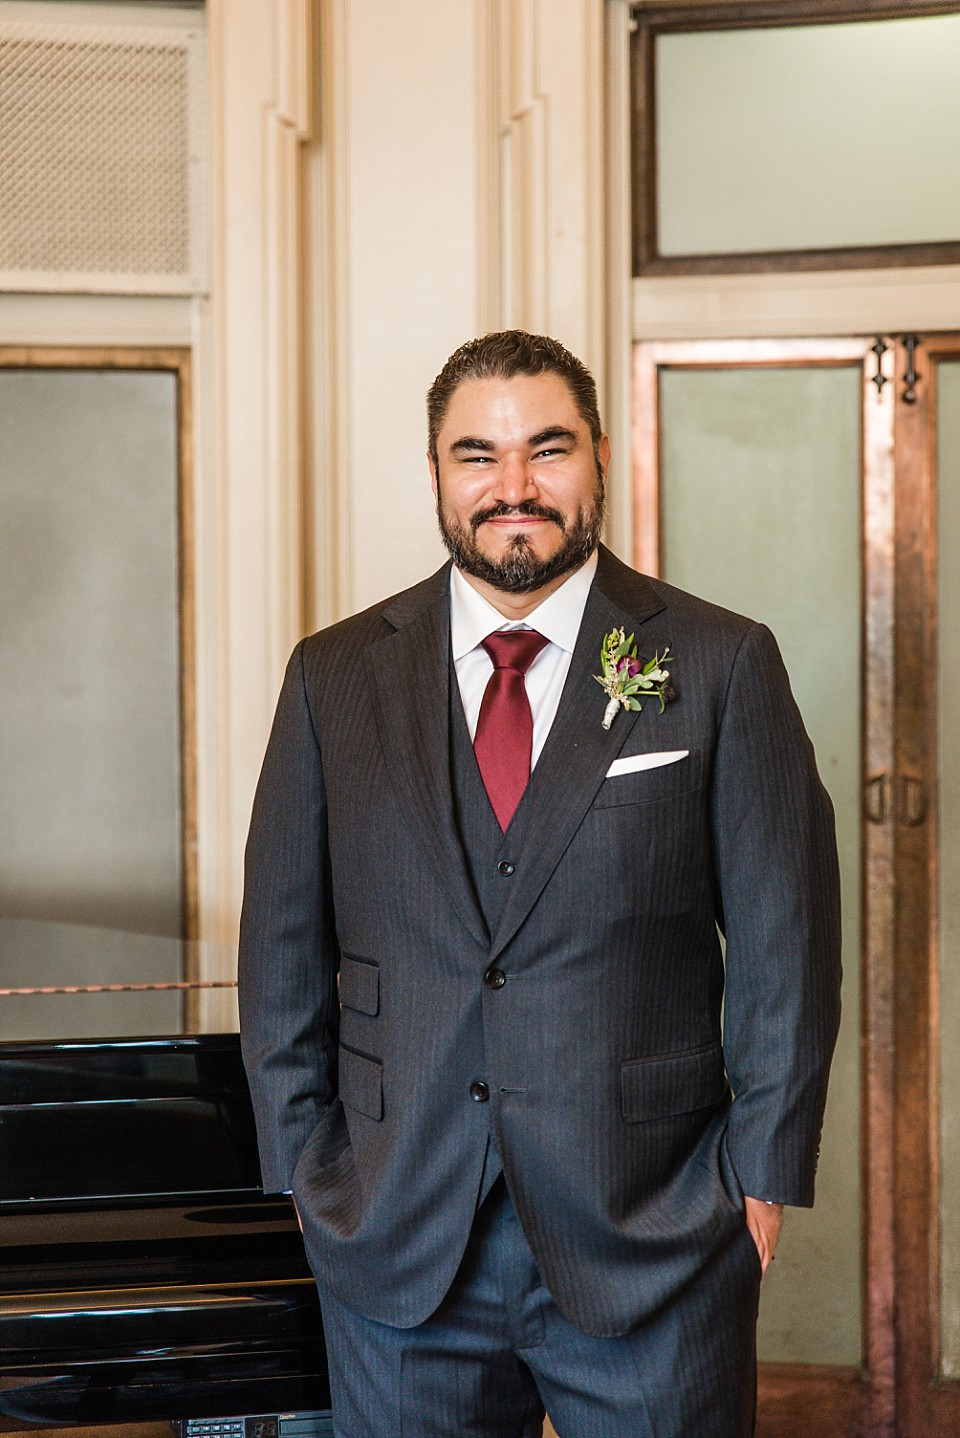 portrait of groom gray suit standing piano Glorietta Bay Inn